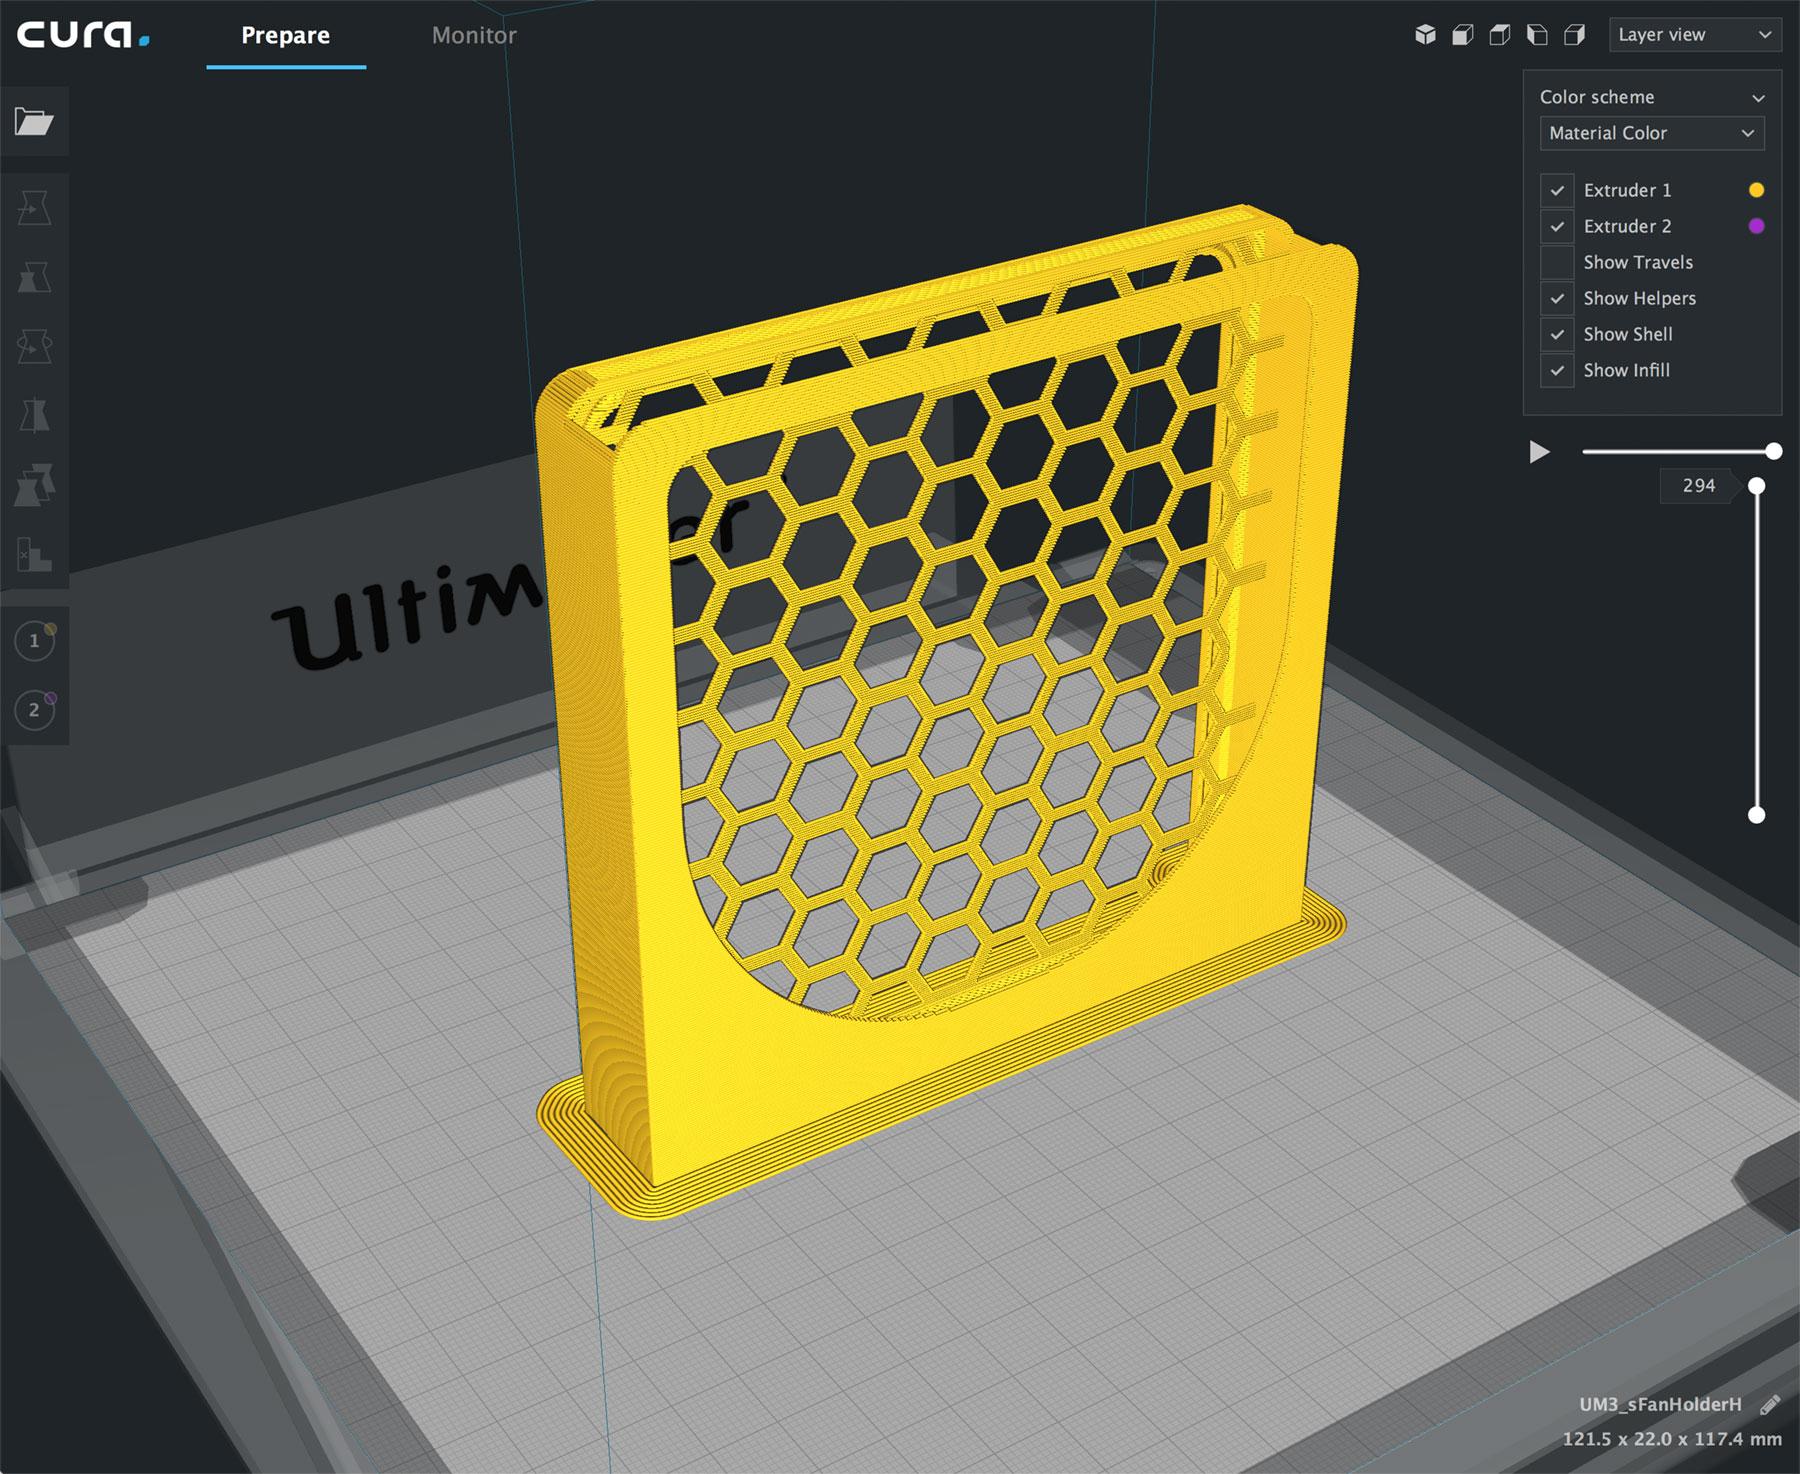 3d_printing_cura-layerview.jpg